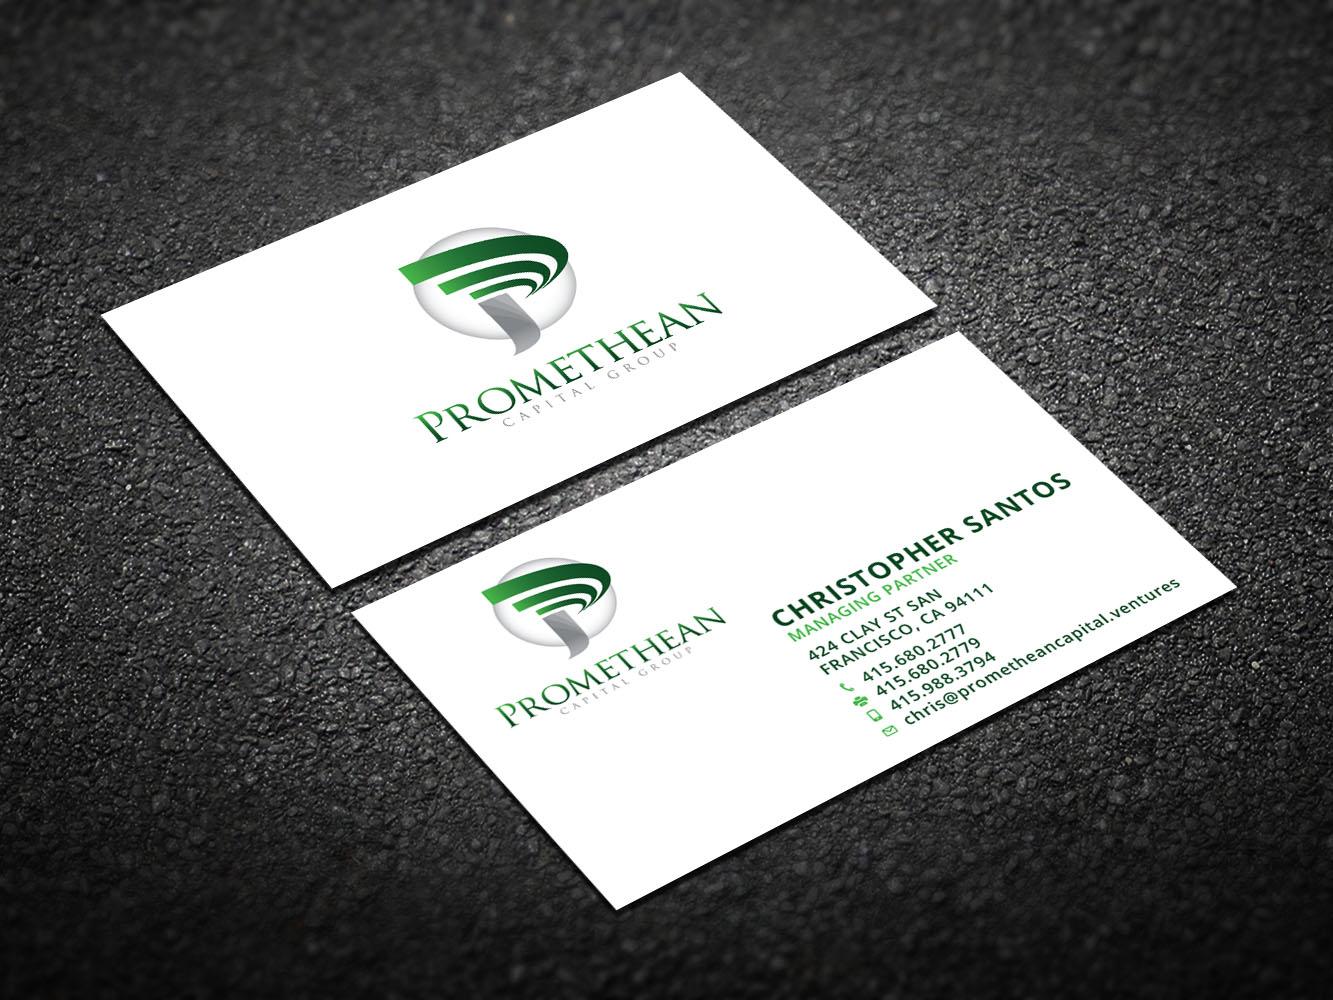 Bold, Modern, Venture Capital Business Card Design for PROMETHEAN ...